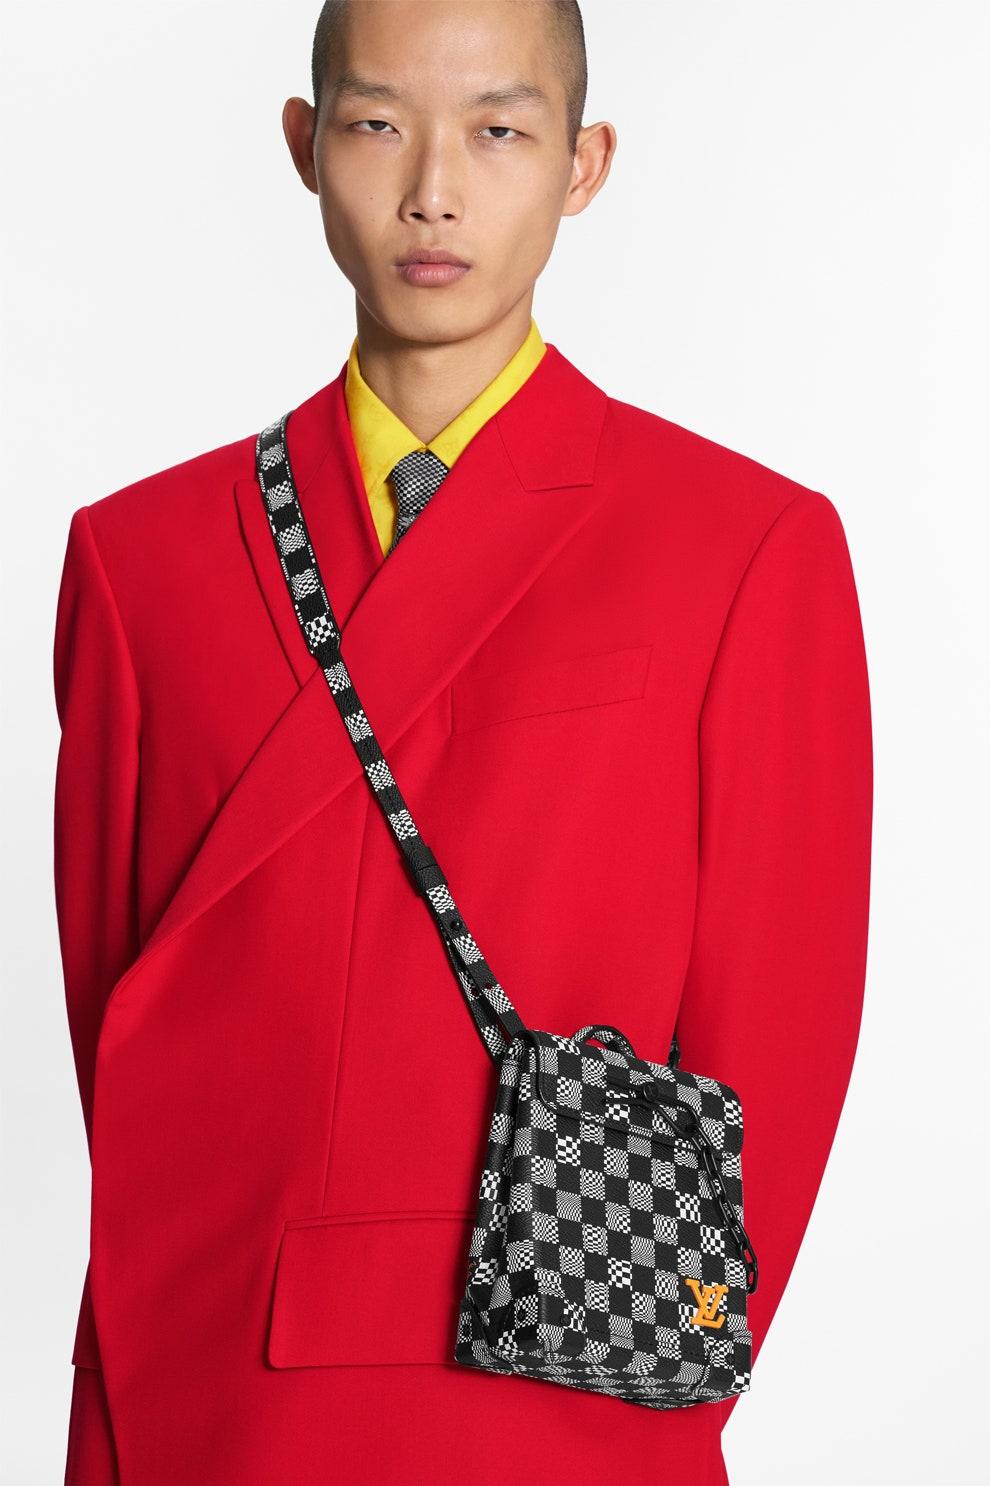 Louis Vuitton выпустили мини-версии сумок Keepall и Steamer